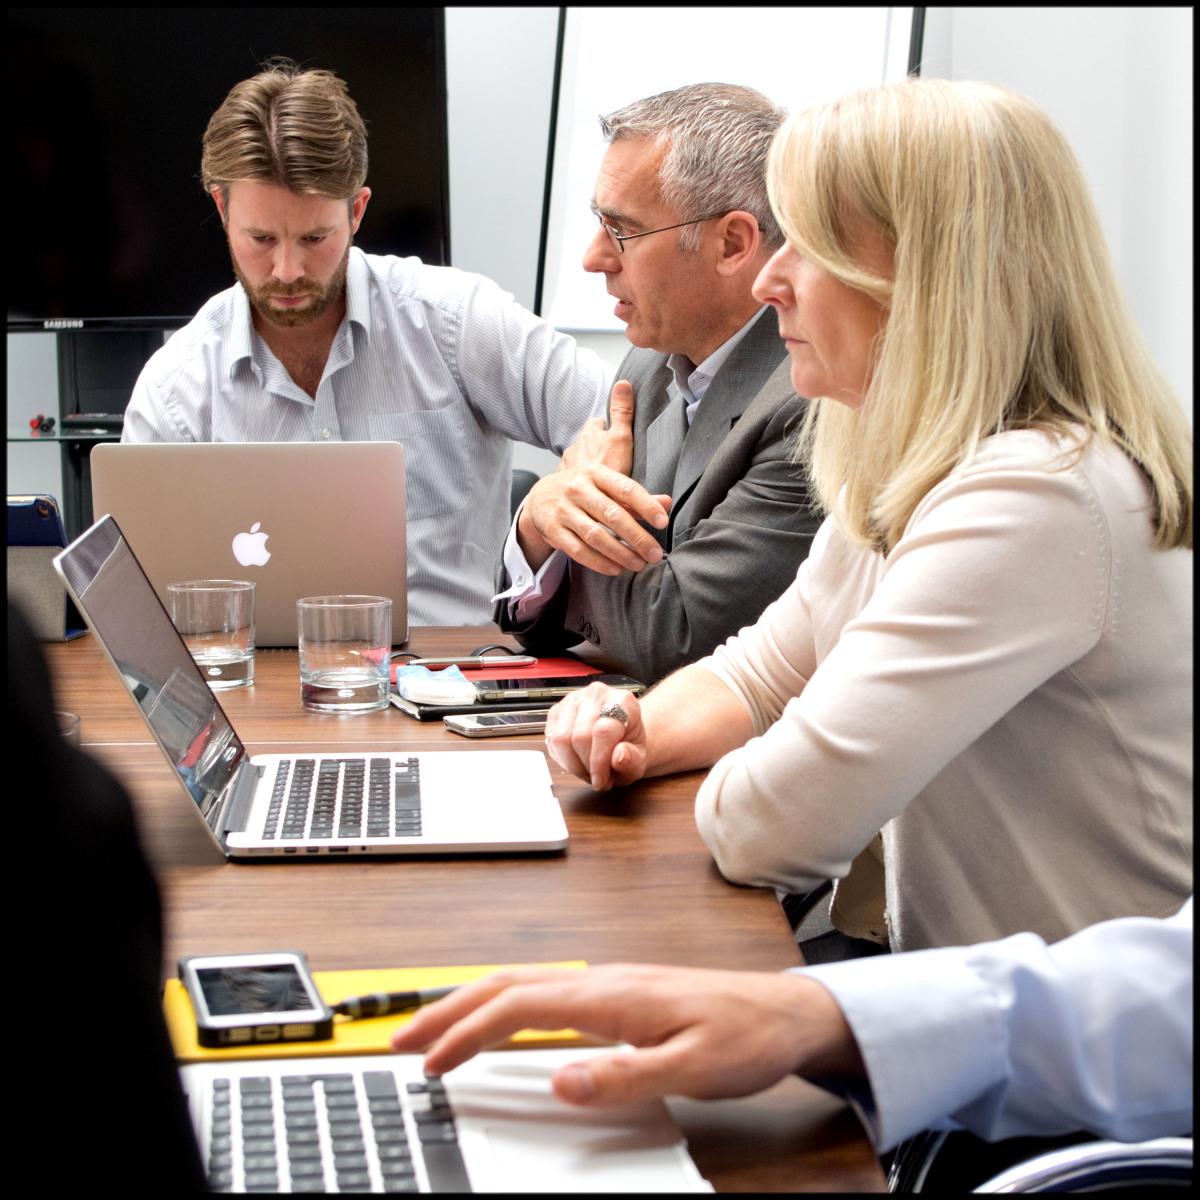 Board-meeting-Sandra-Sergeant-Photography-Basingstoke-Photographer